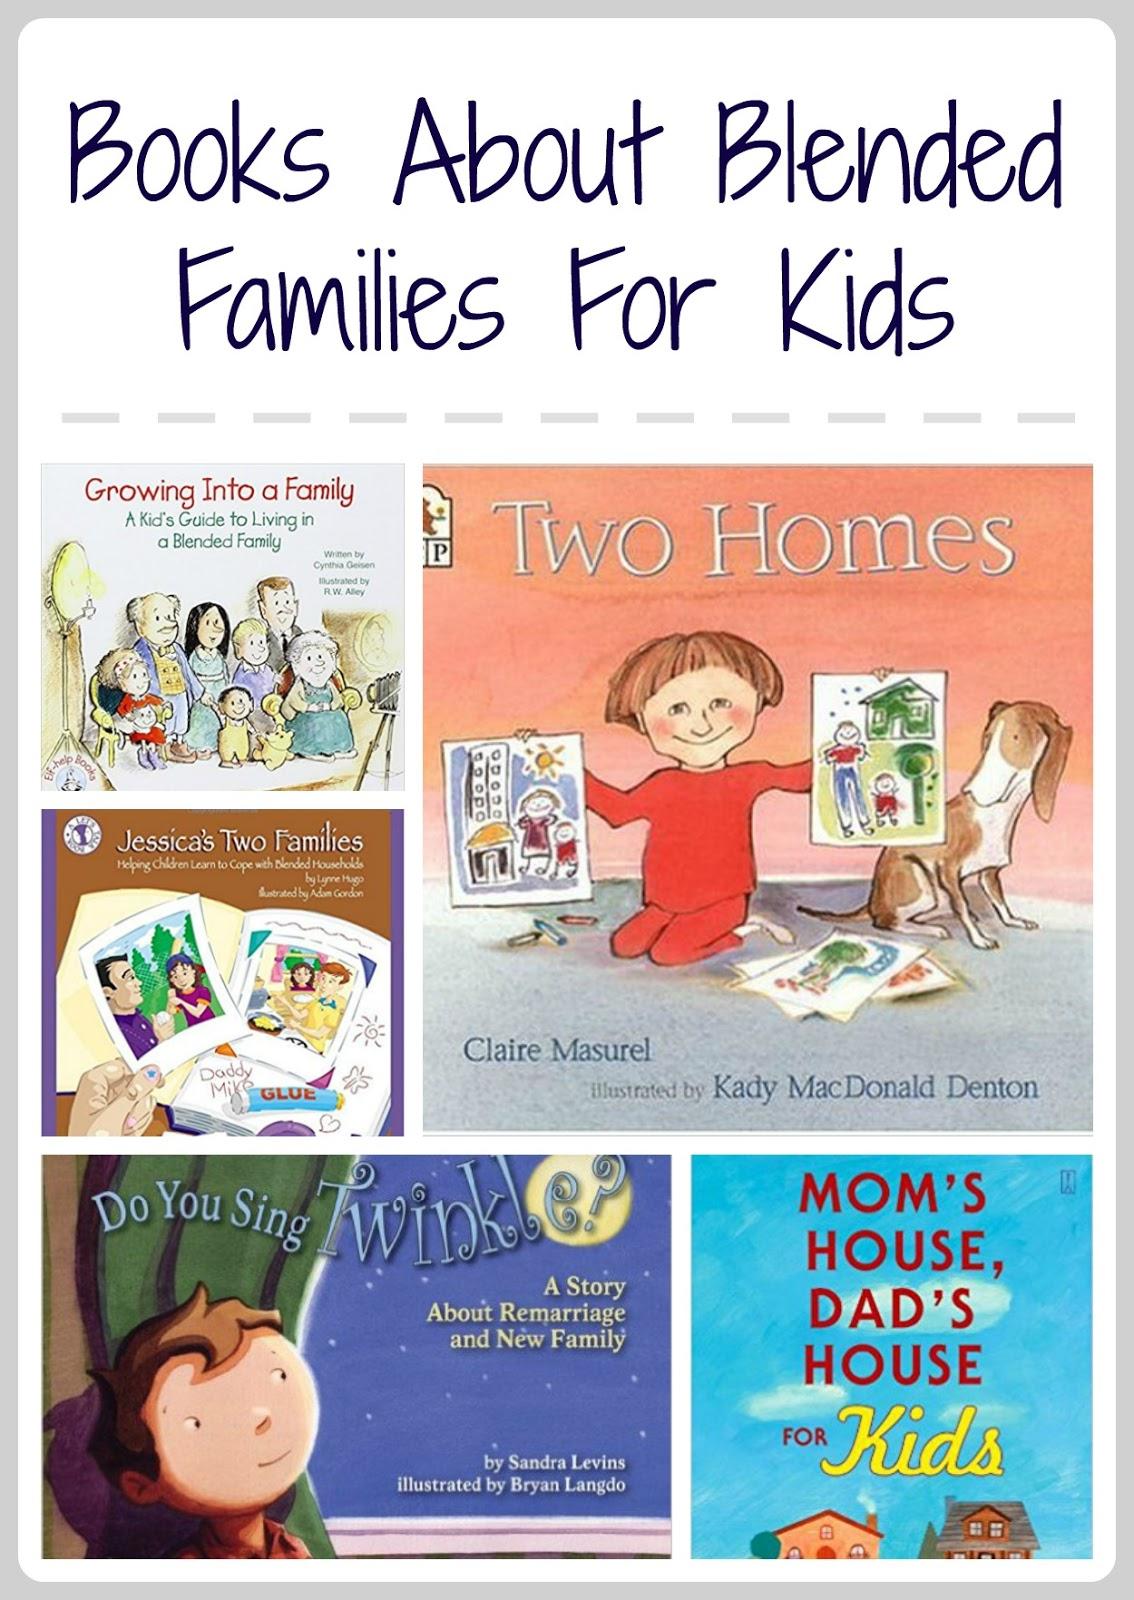 books blended families children kid miami night chances second homes masurel claire lifestyle